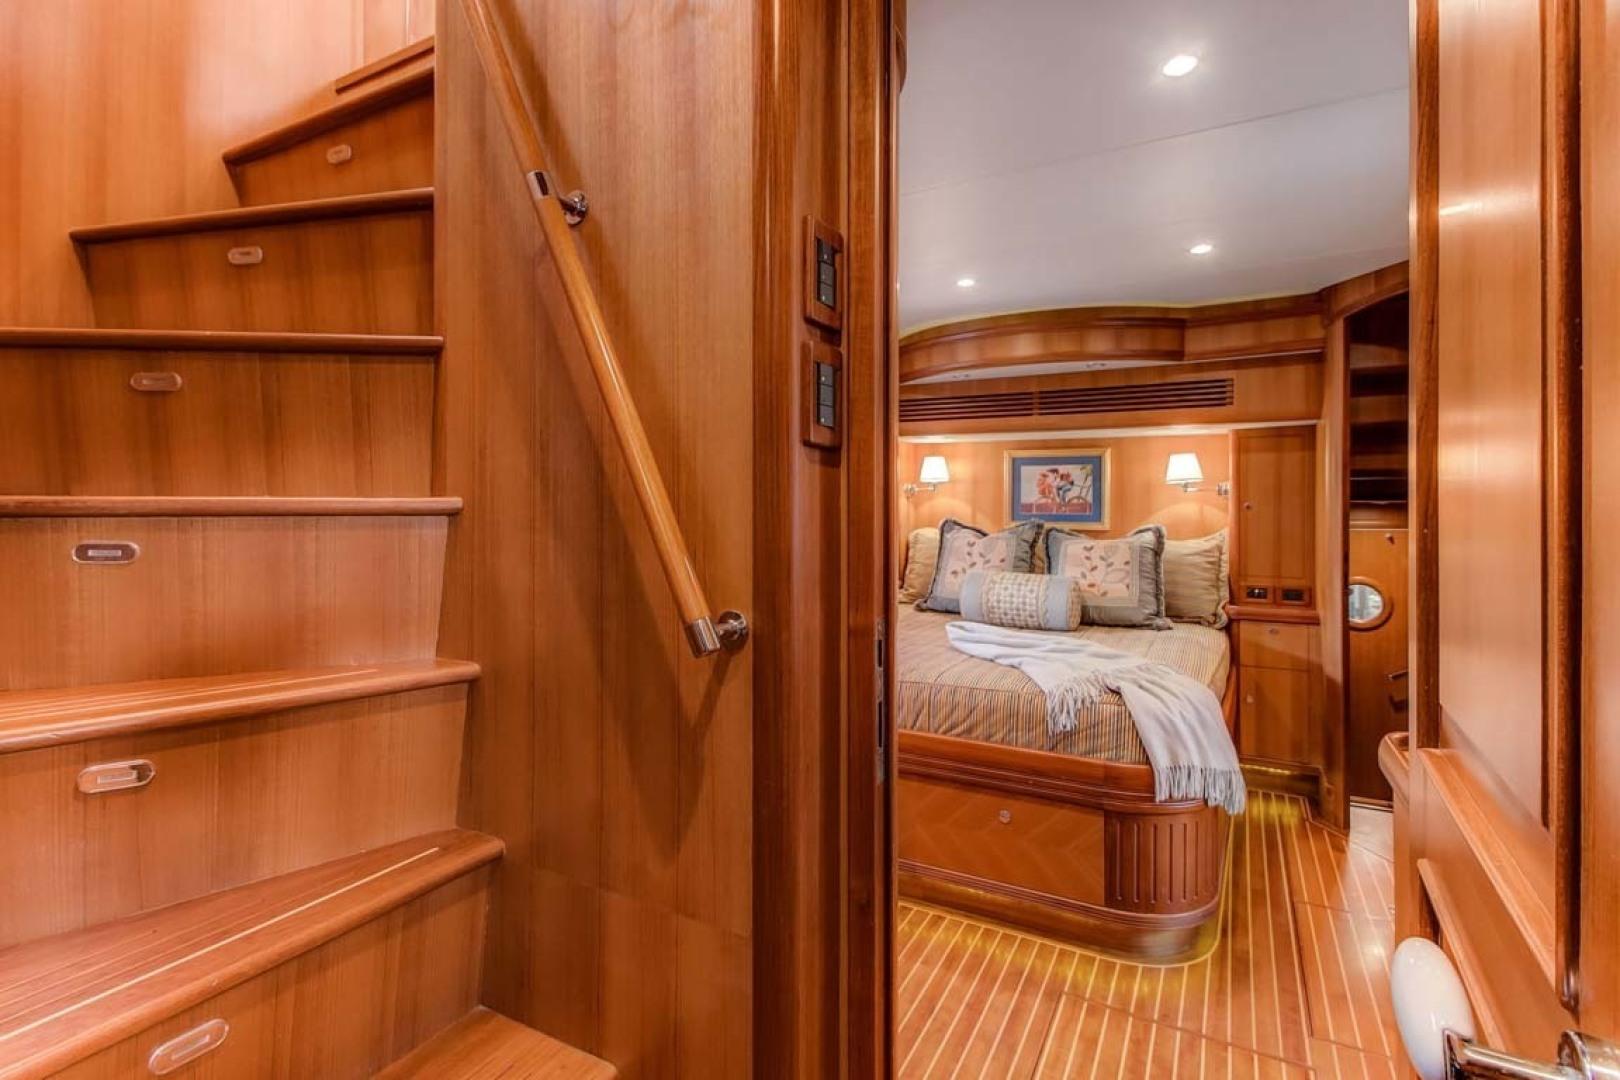 Selene-60 Ocean Trawler 2010-Gypsy Magic Jacksonville-Florida-United States-Master Stateroom-1346747   Thumbnail